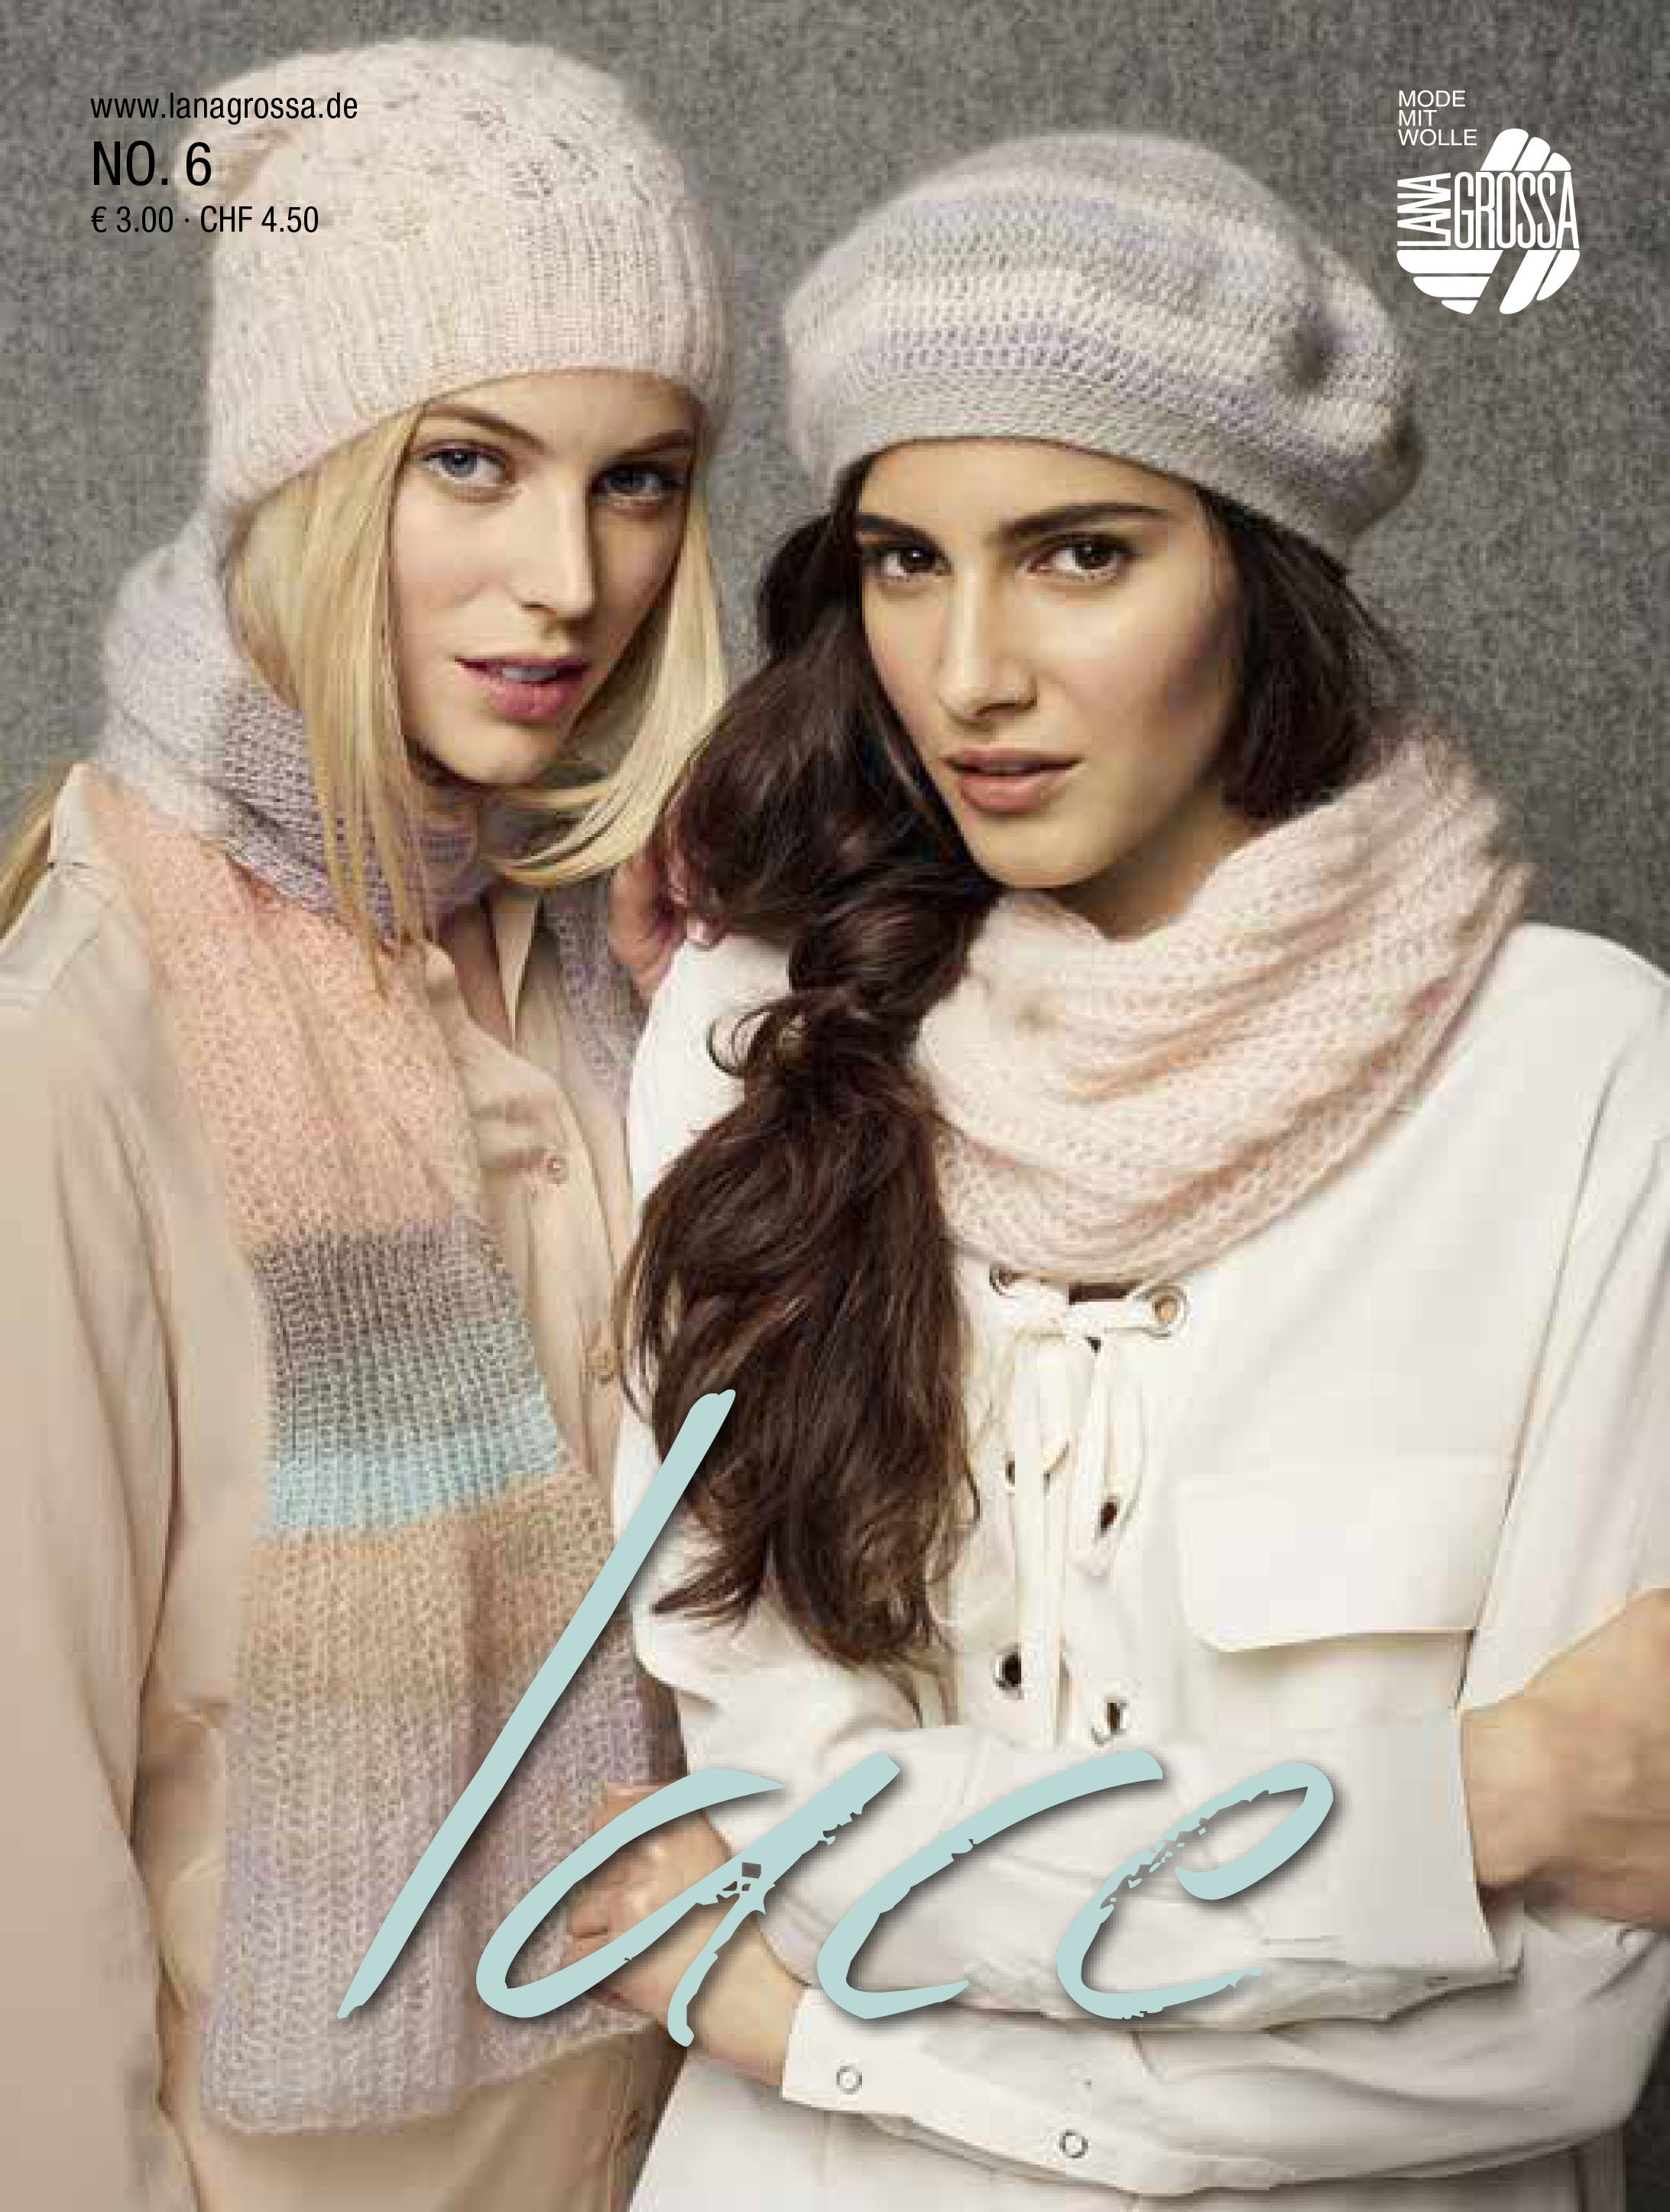 Lana Grossa LACE No. 6 - Журнал на немецком и на русском языке инструкции